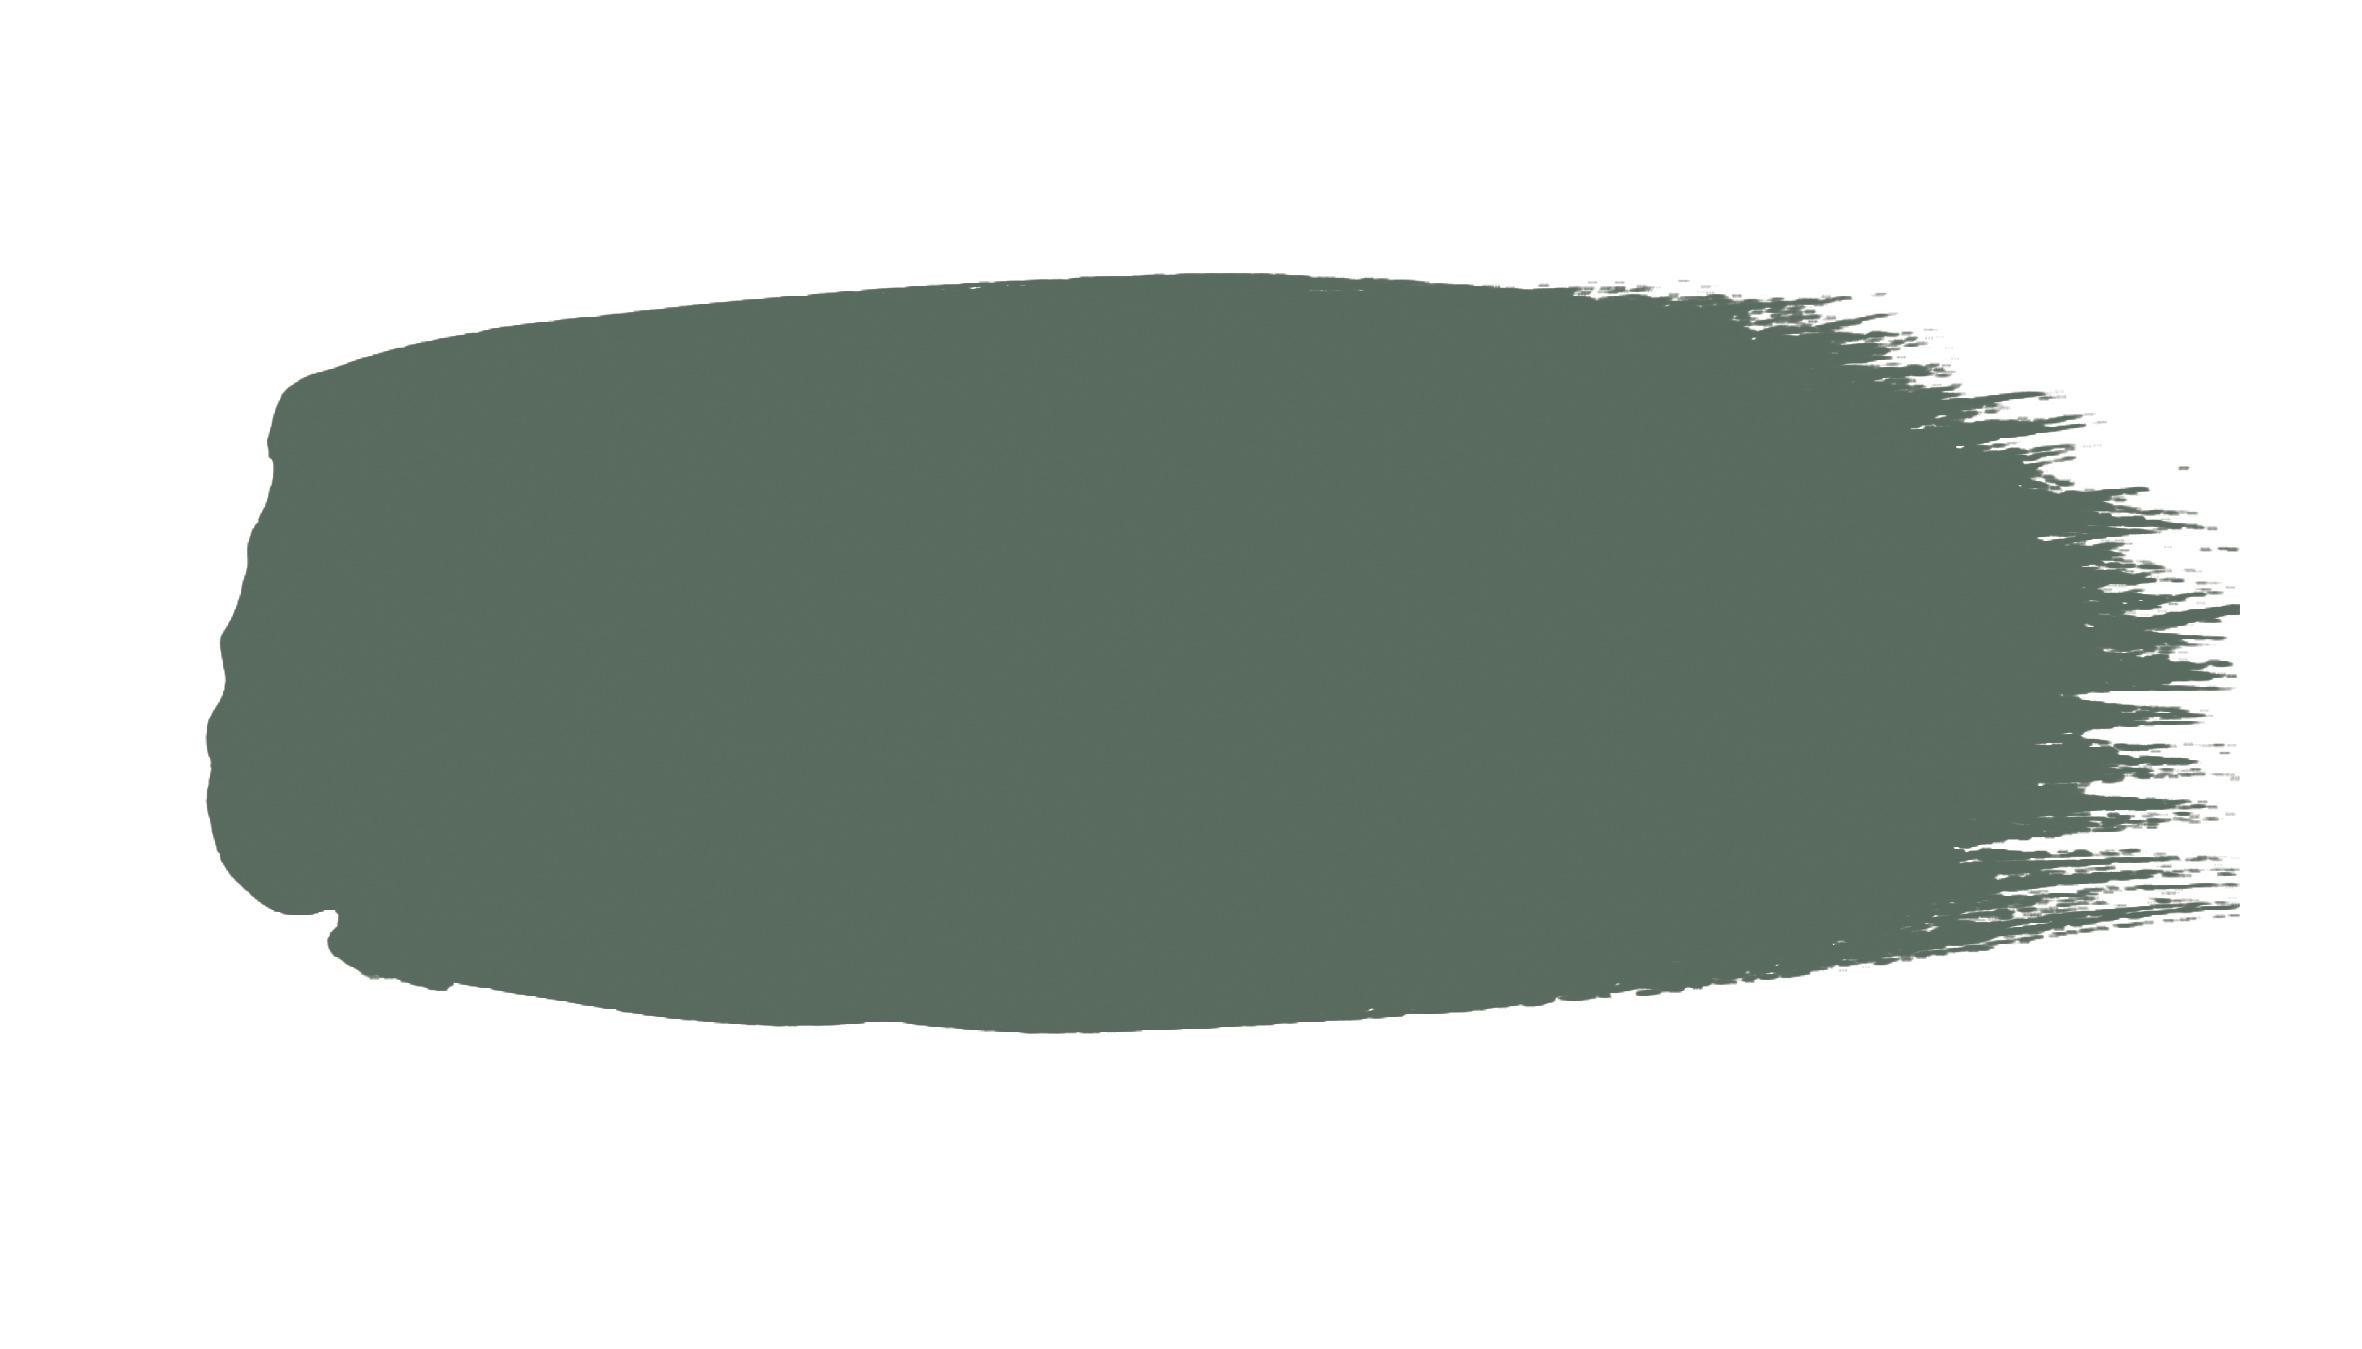 Peinture Vert Fougère - Ho Ho Green n°305 - Little Greene